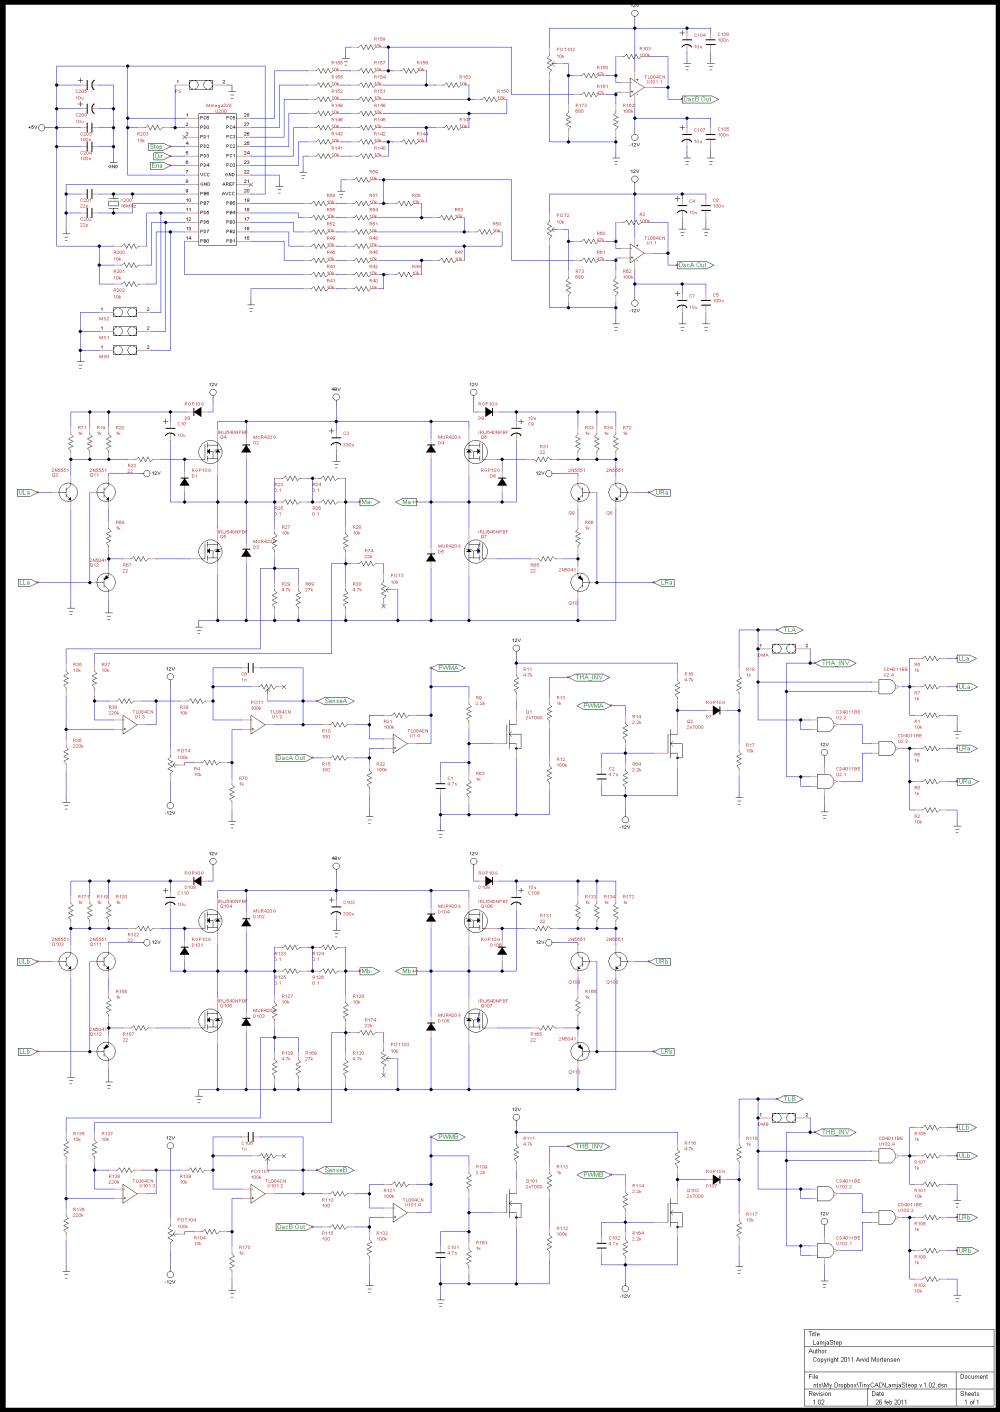 medium resolution of i m working on a new stepper motor